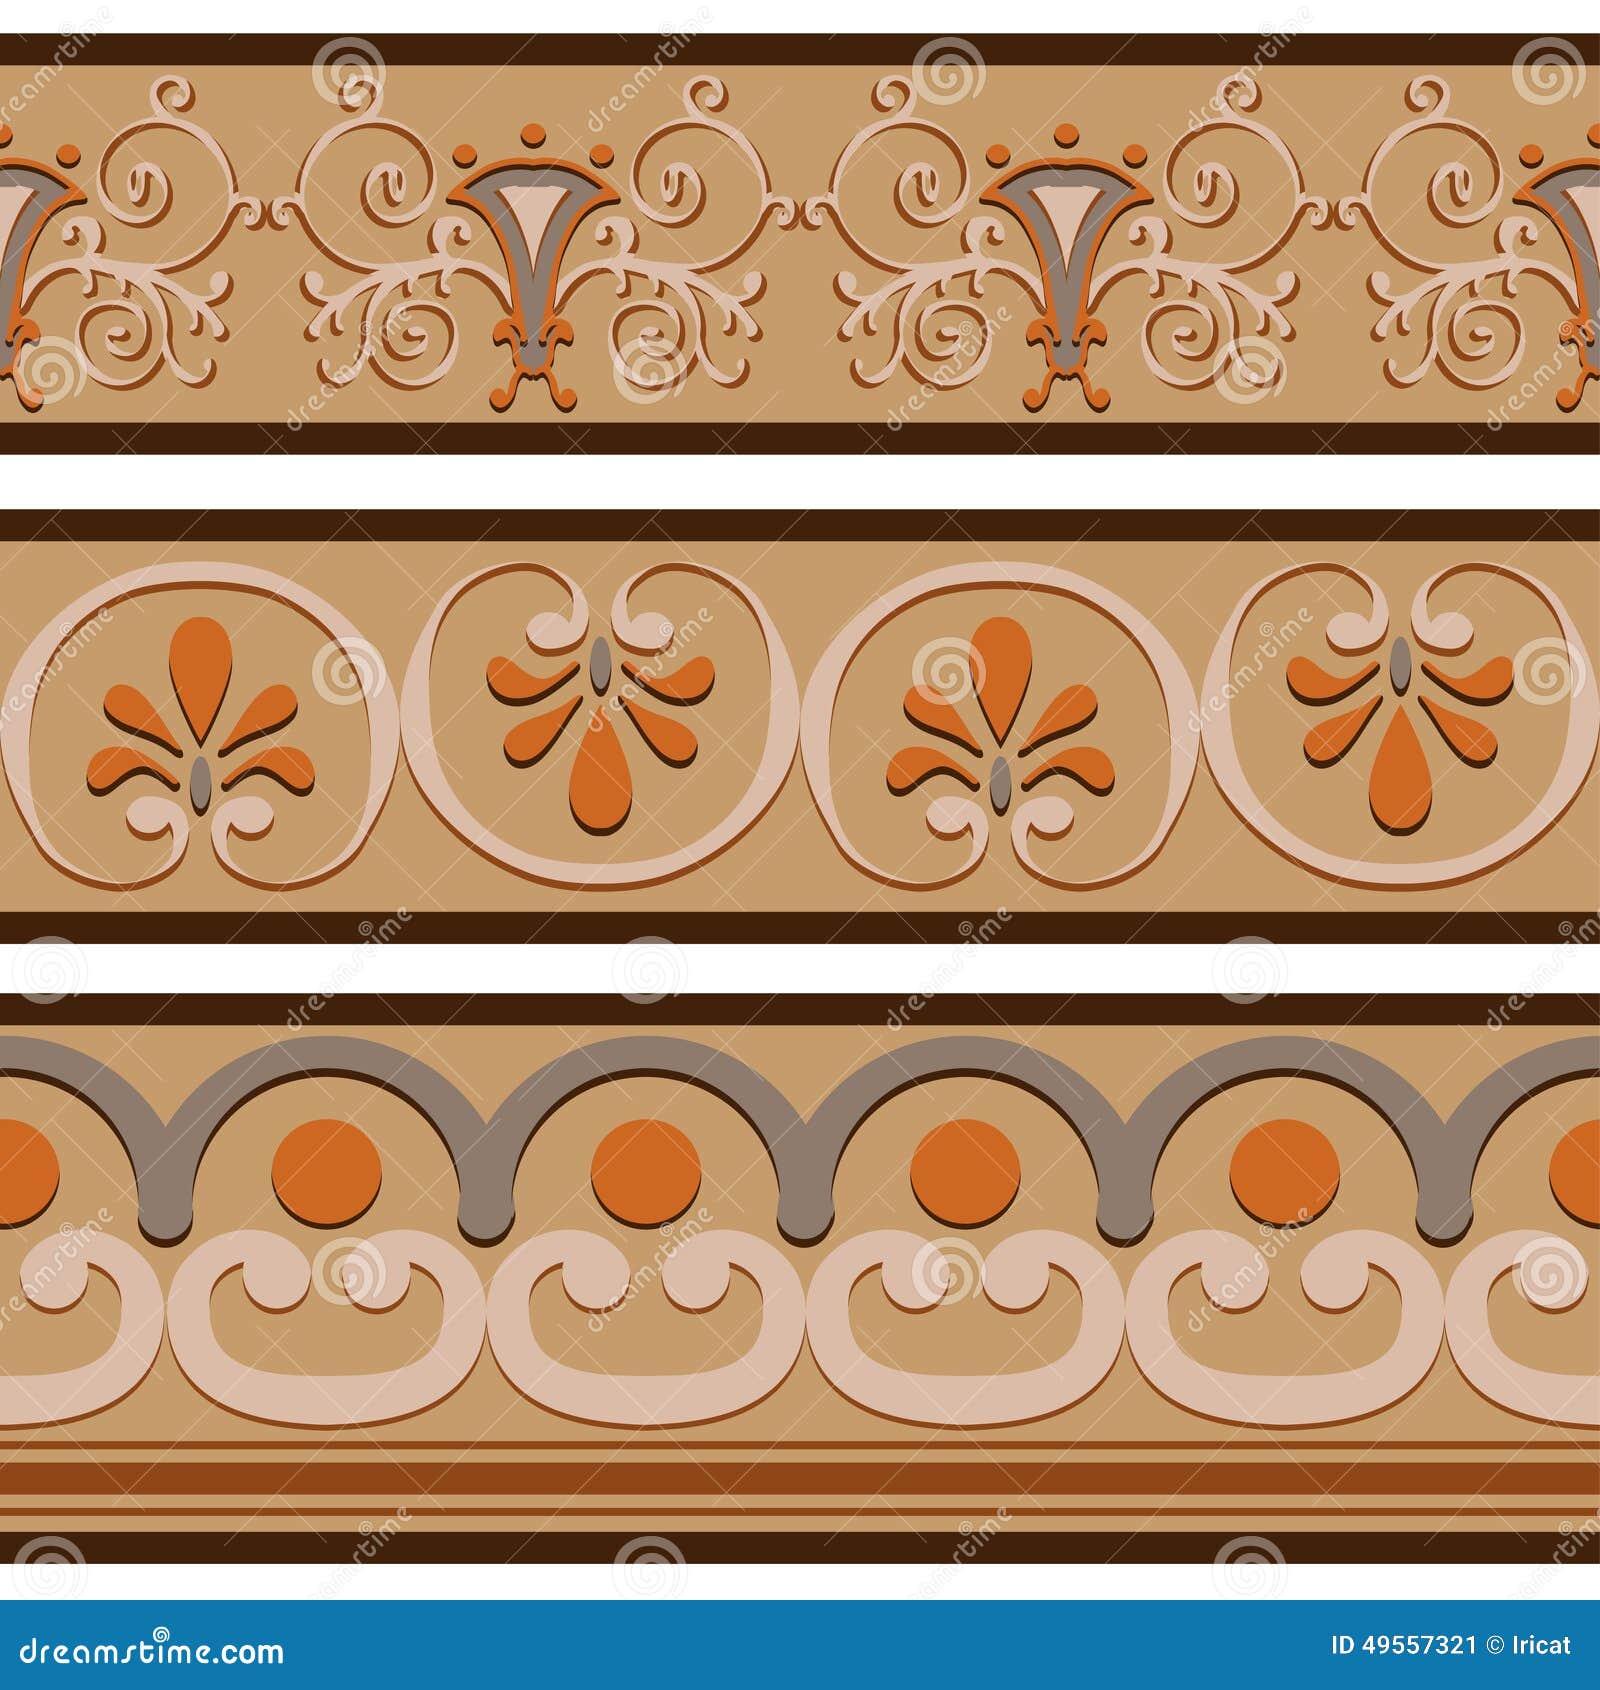 set of ancient roman ornaments border patterns  stock